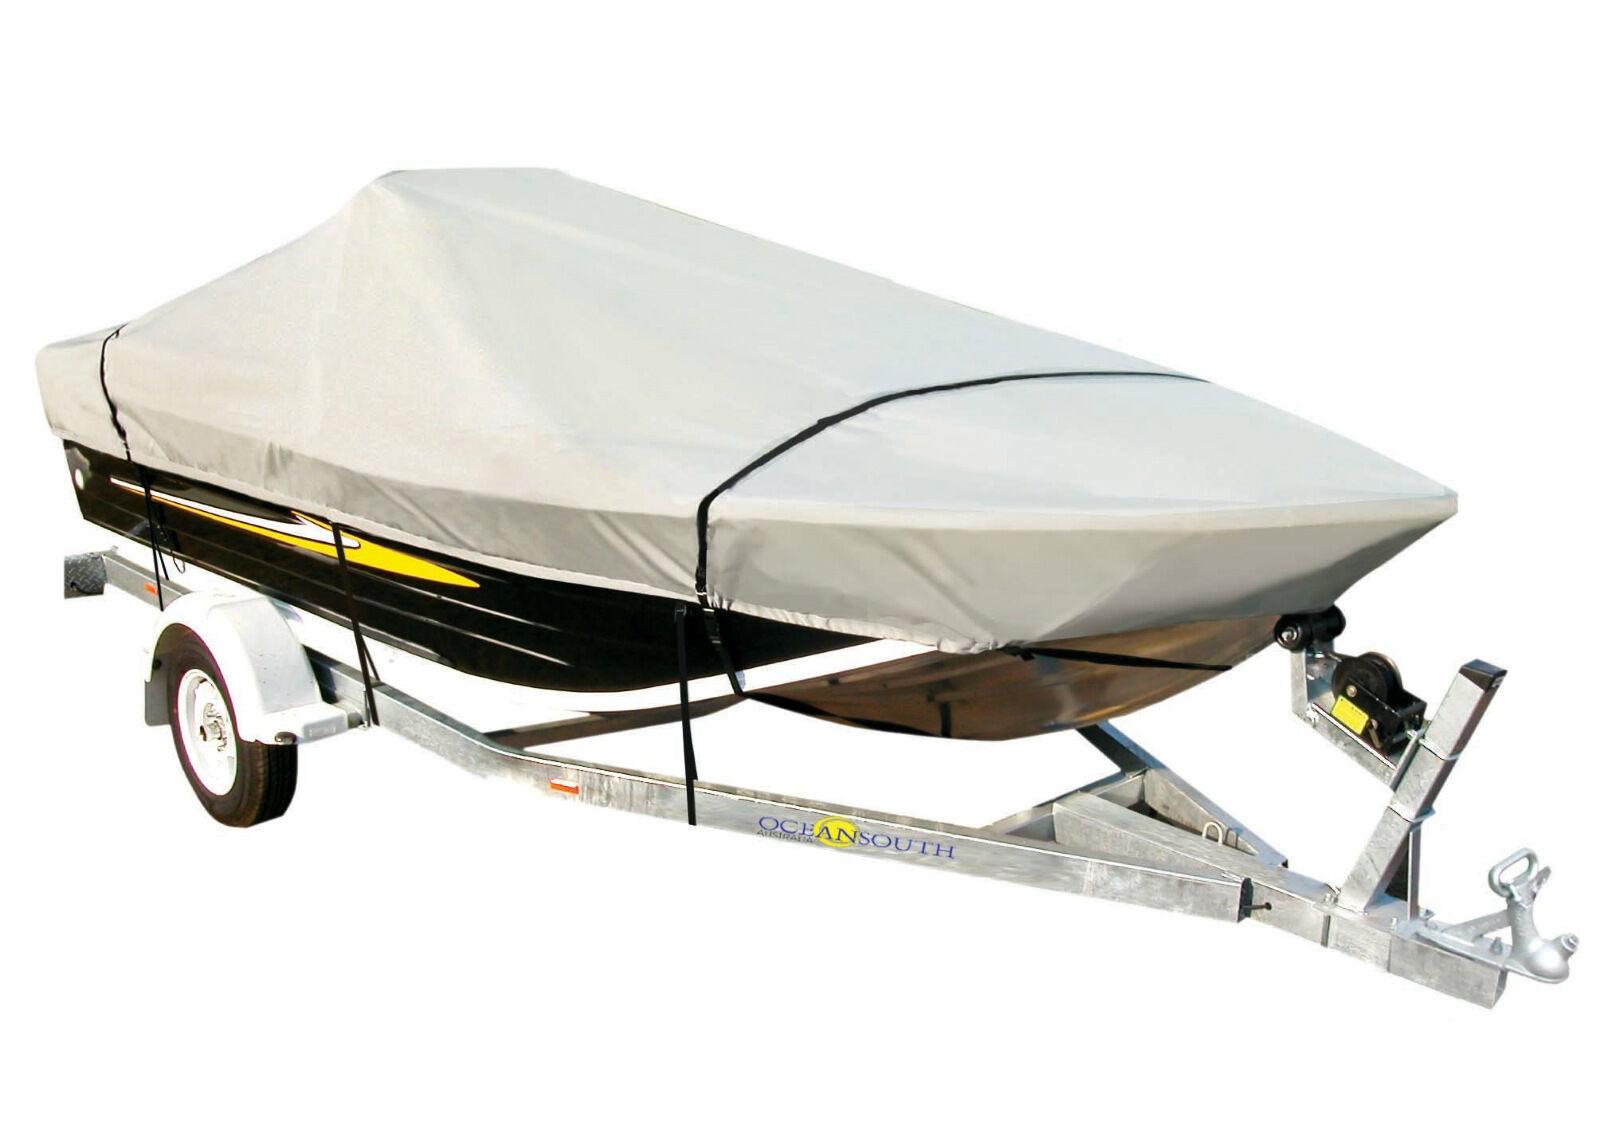 OceanSouth Venepeite sivupulpetti veneille 4.5-4.7 m